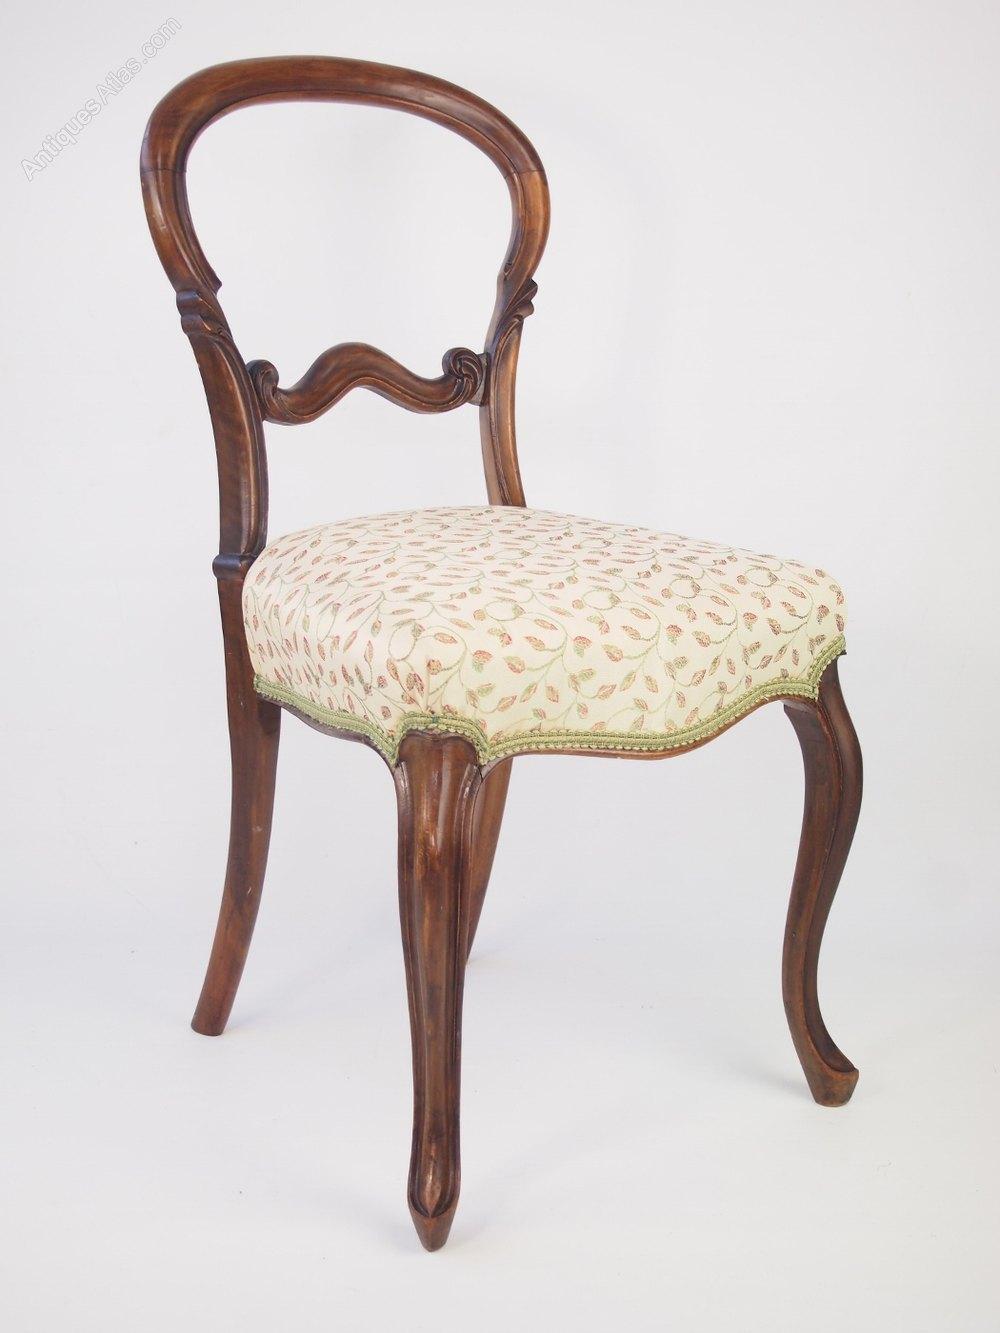 Antique Victorian Walnut Balloon Back Chair Antiques Atlas